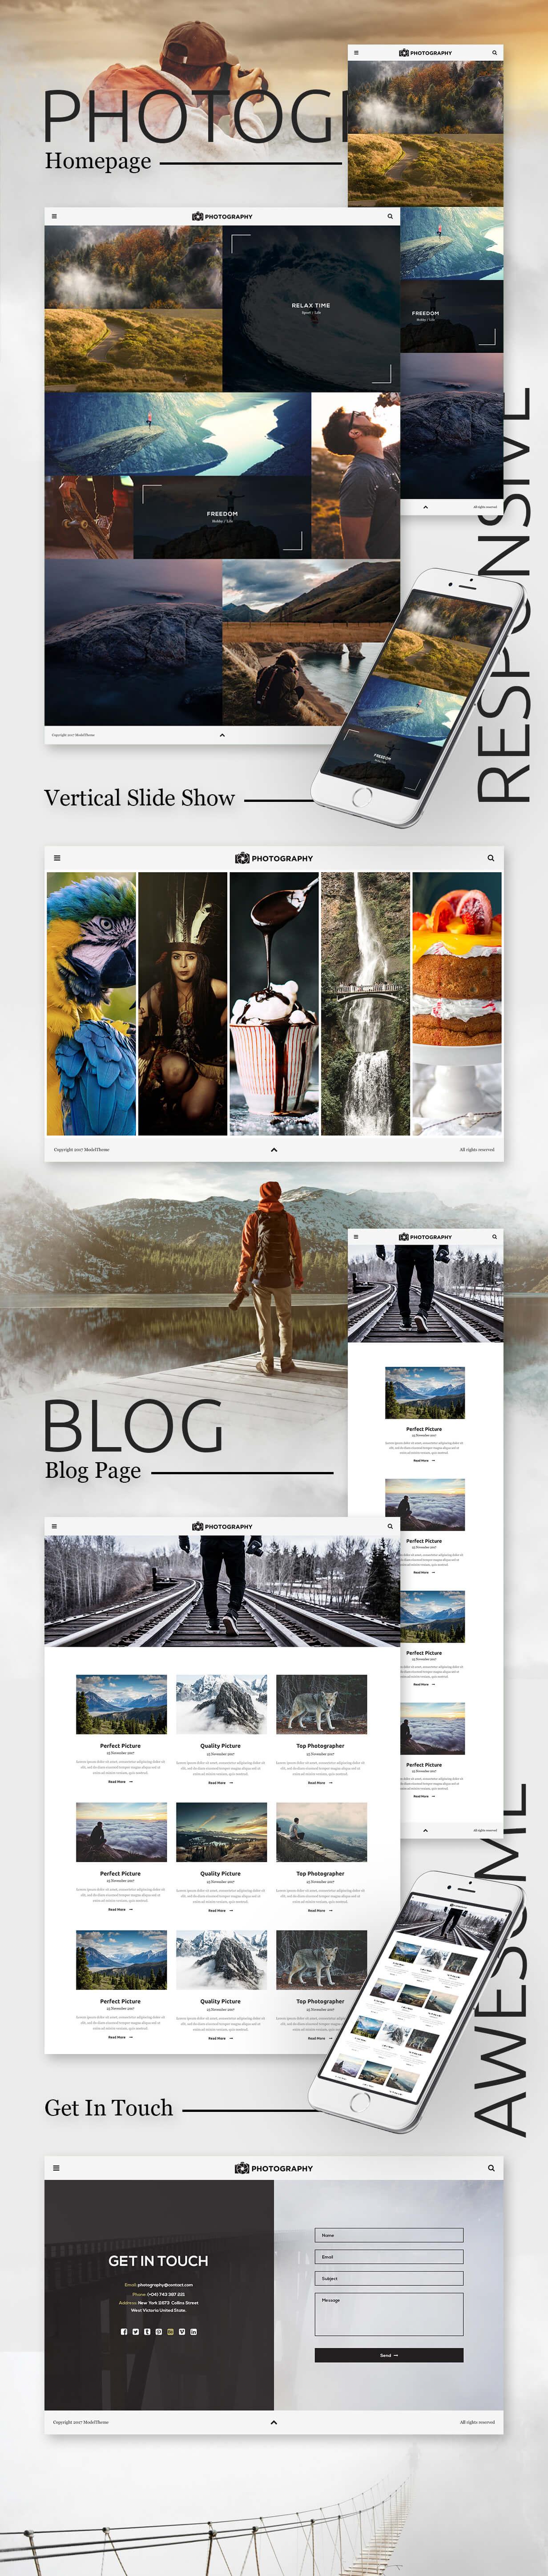 MT Photography - Eye-catching, Unique Photography WordPress Theme - 3